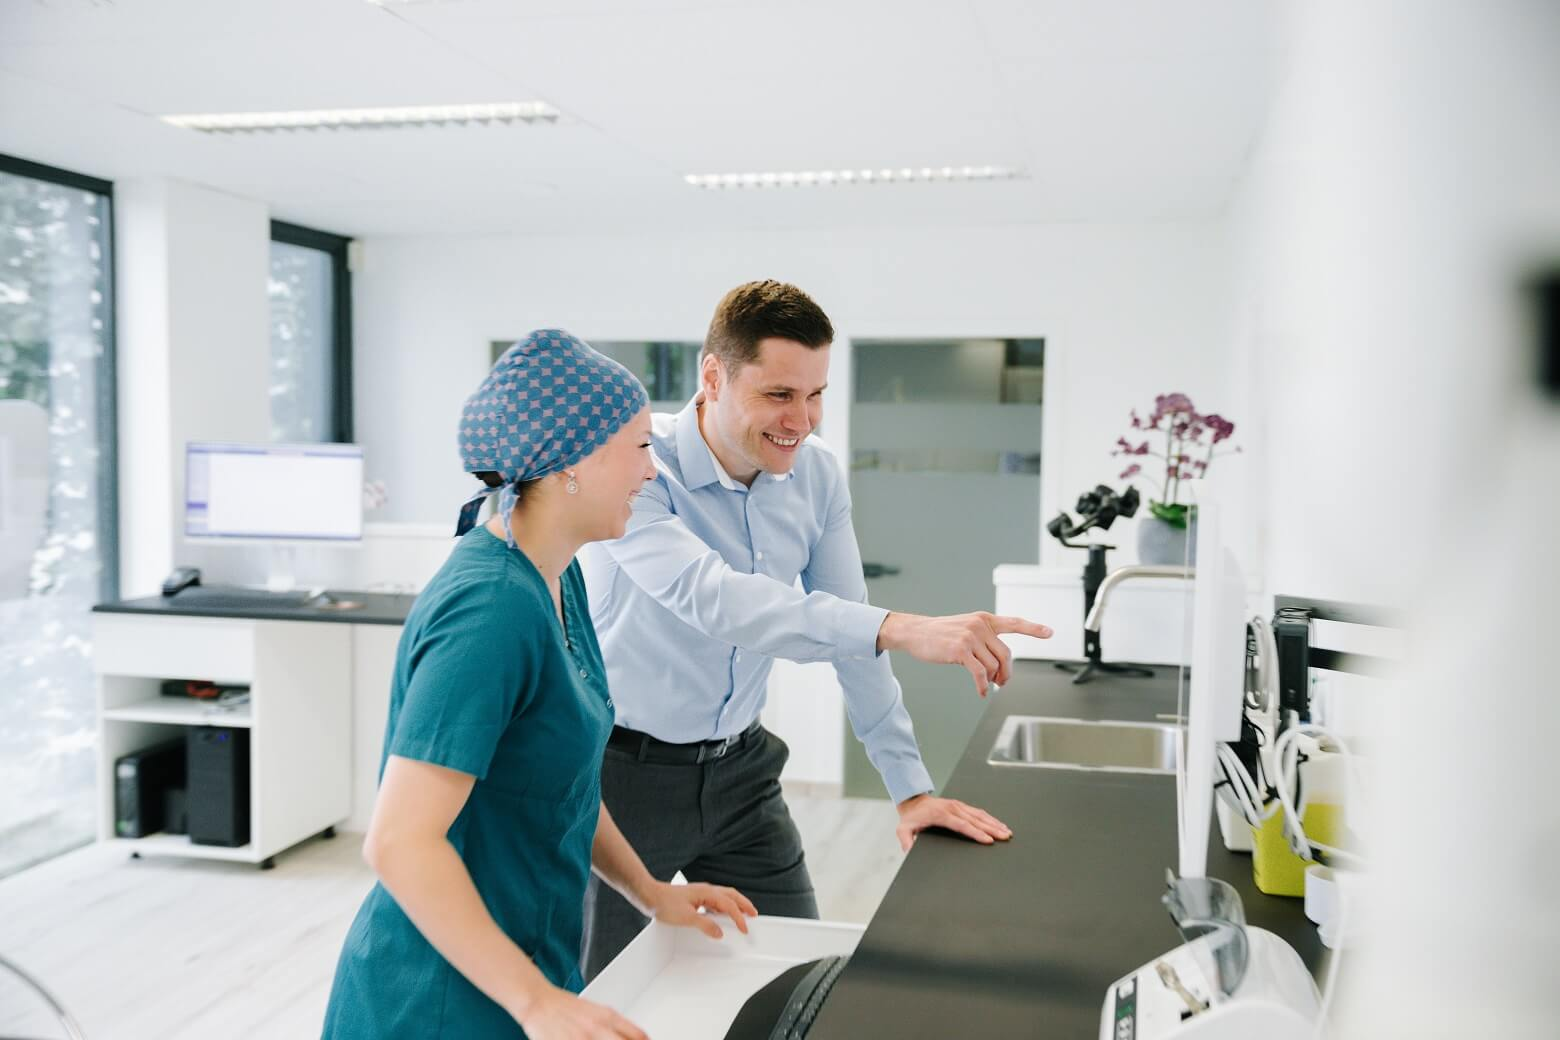 HelpIT-service-informatique-Braine-l-alleud-brabant-wallon-specialiste-cabinet-dentaire-installation-PME-dentistes-aide